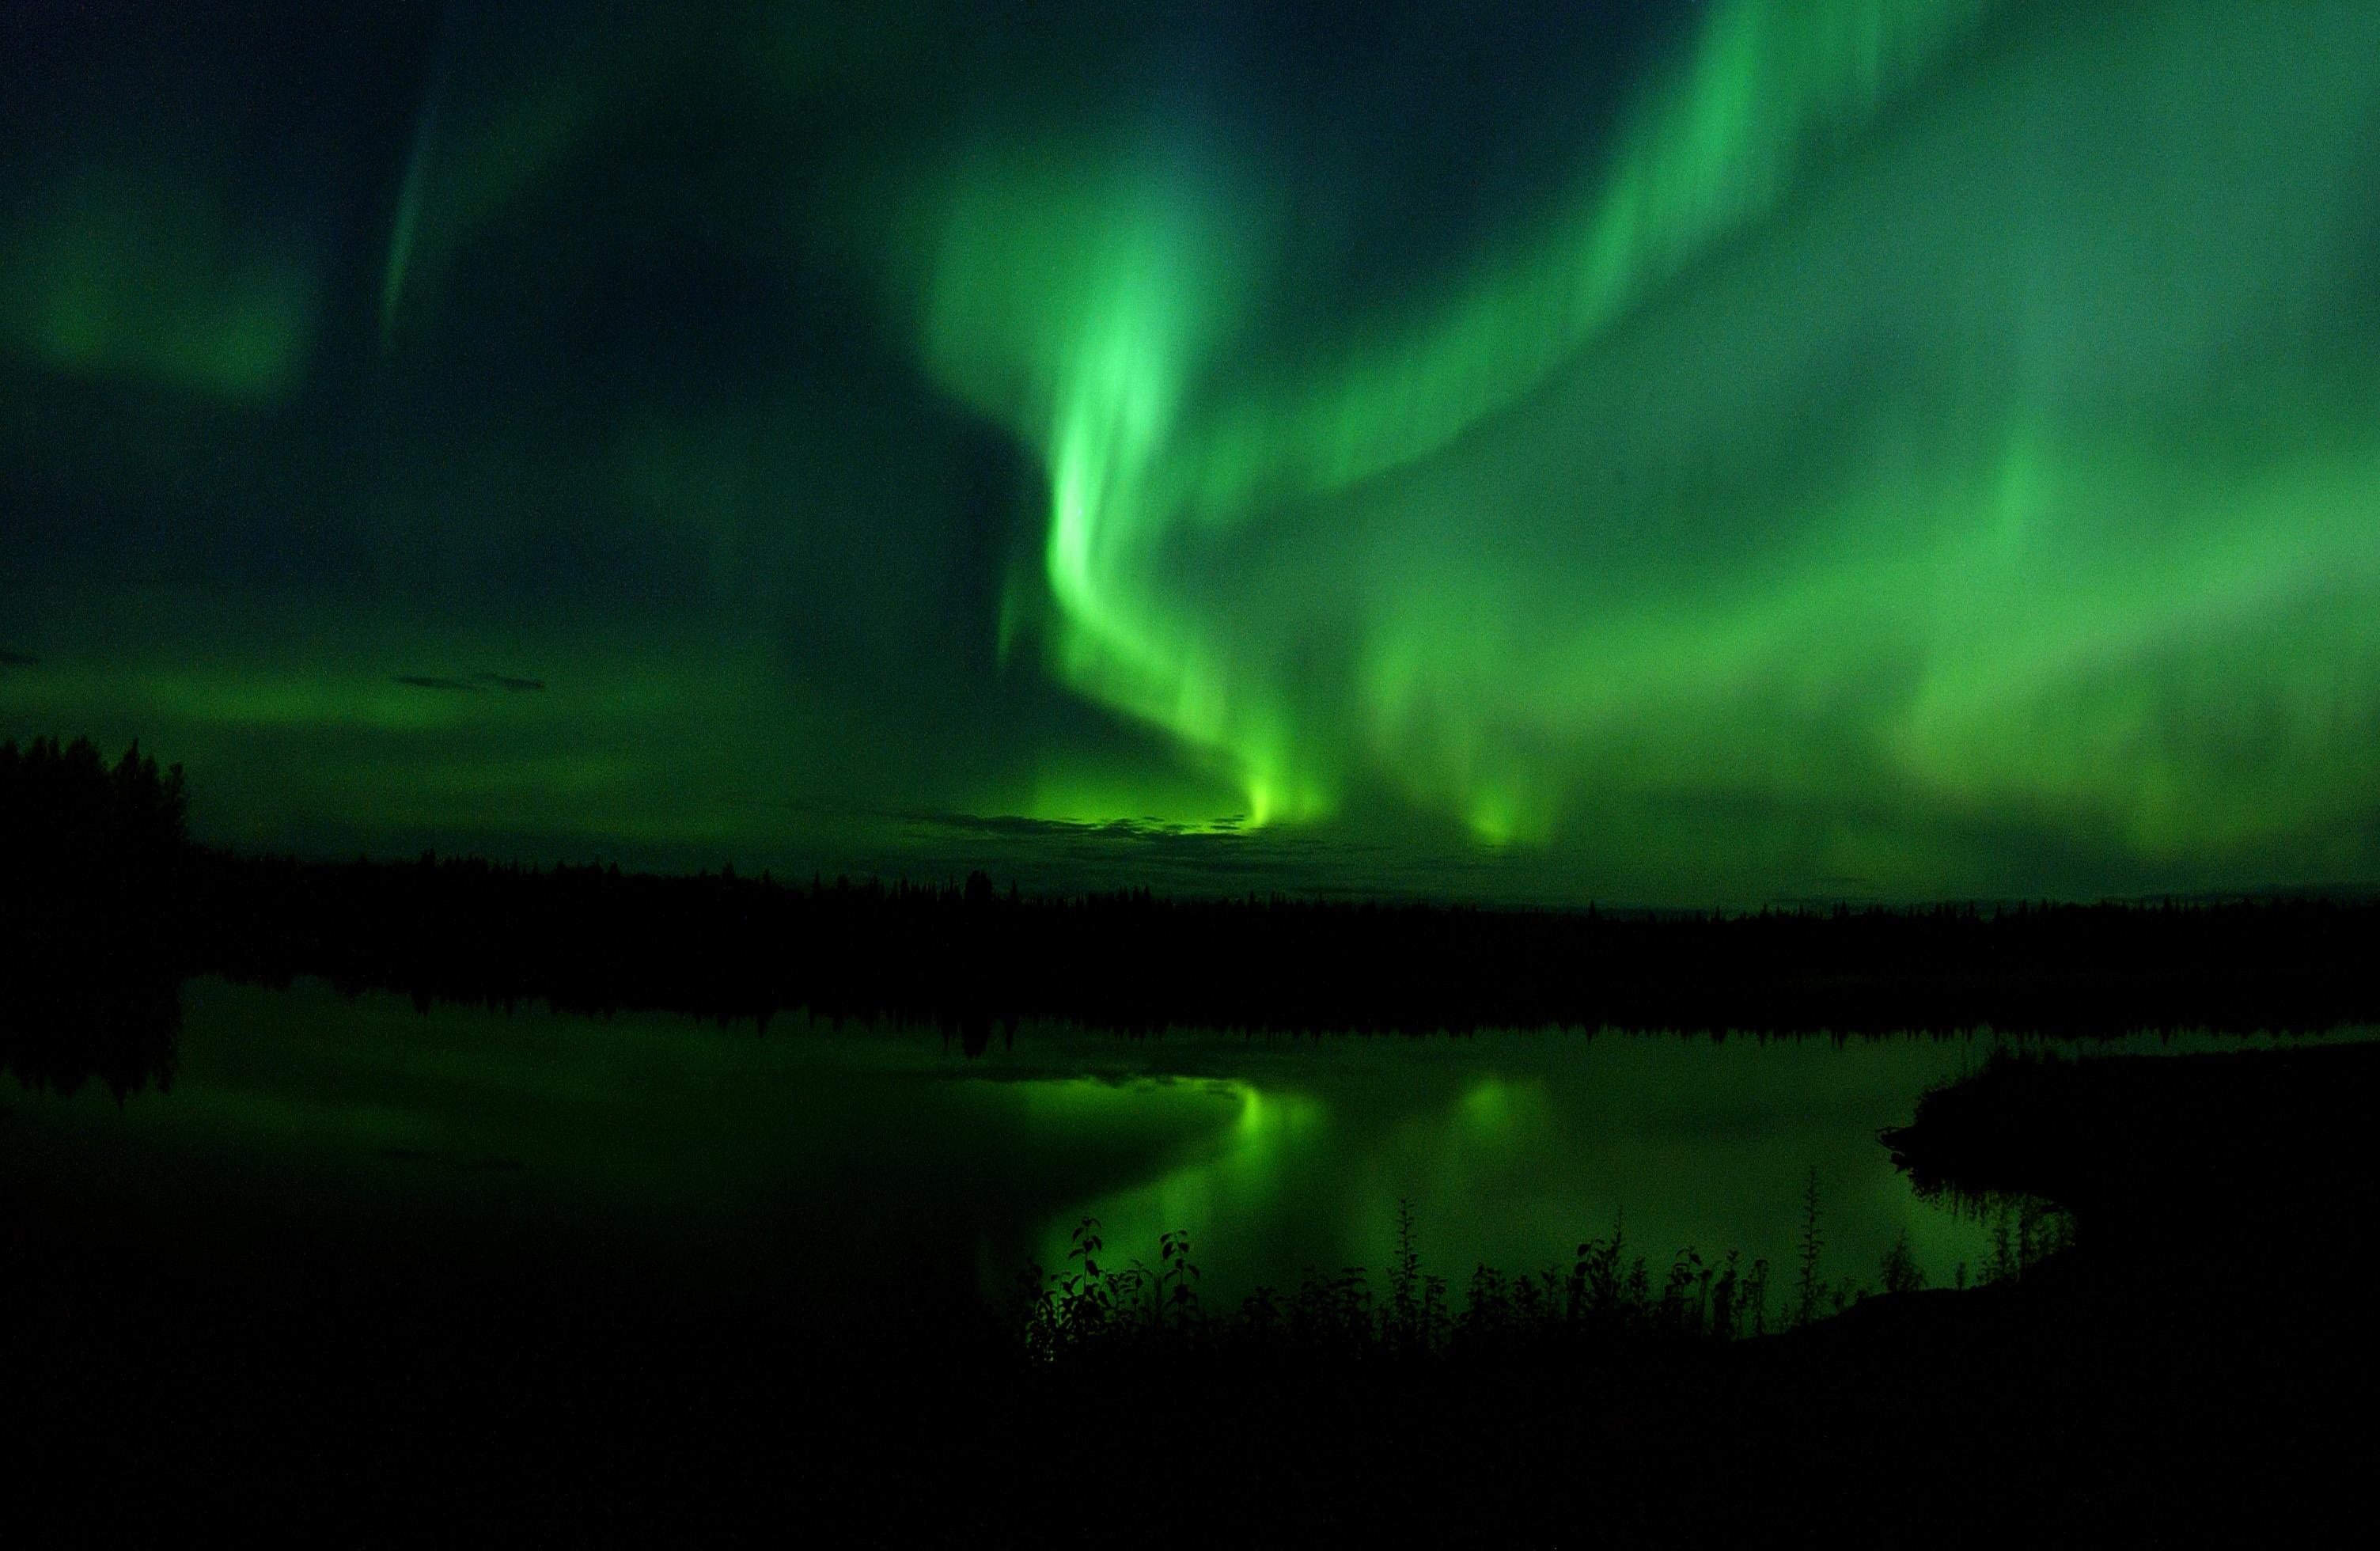 FileThe Aurora Borealis or Northern Lights shine above Bear Lake